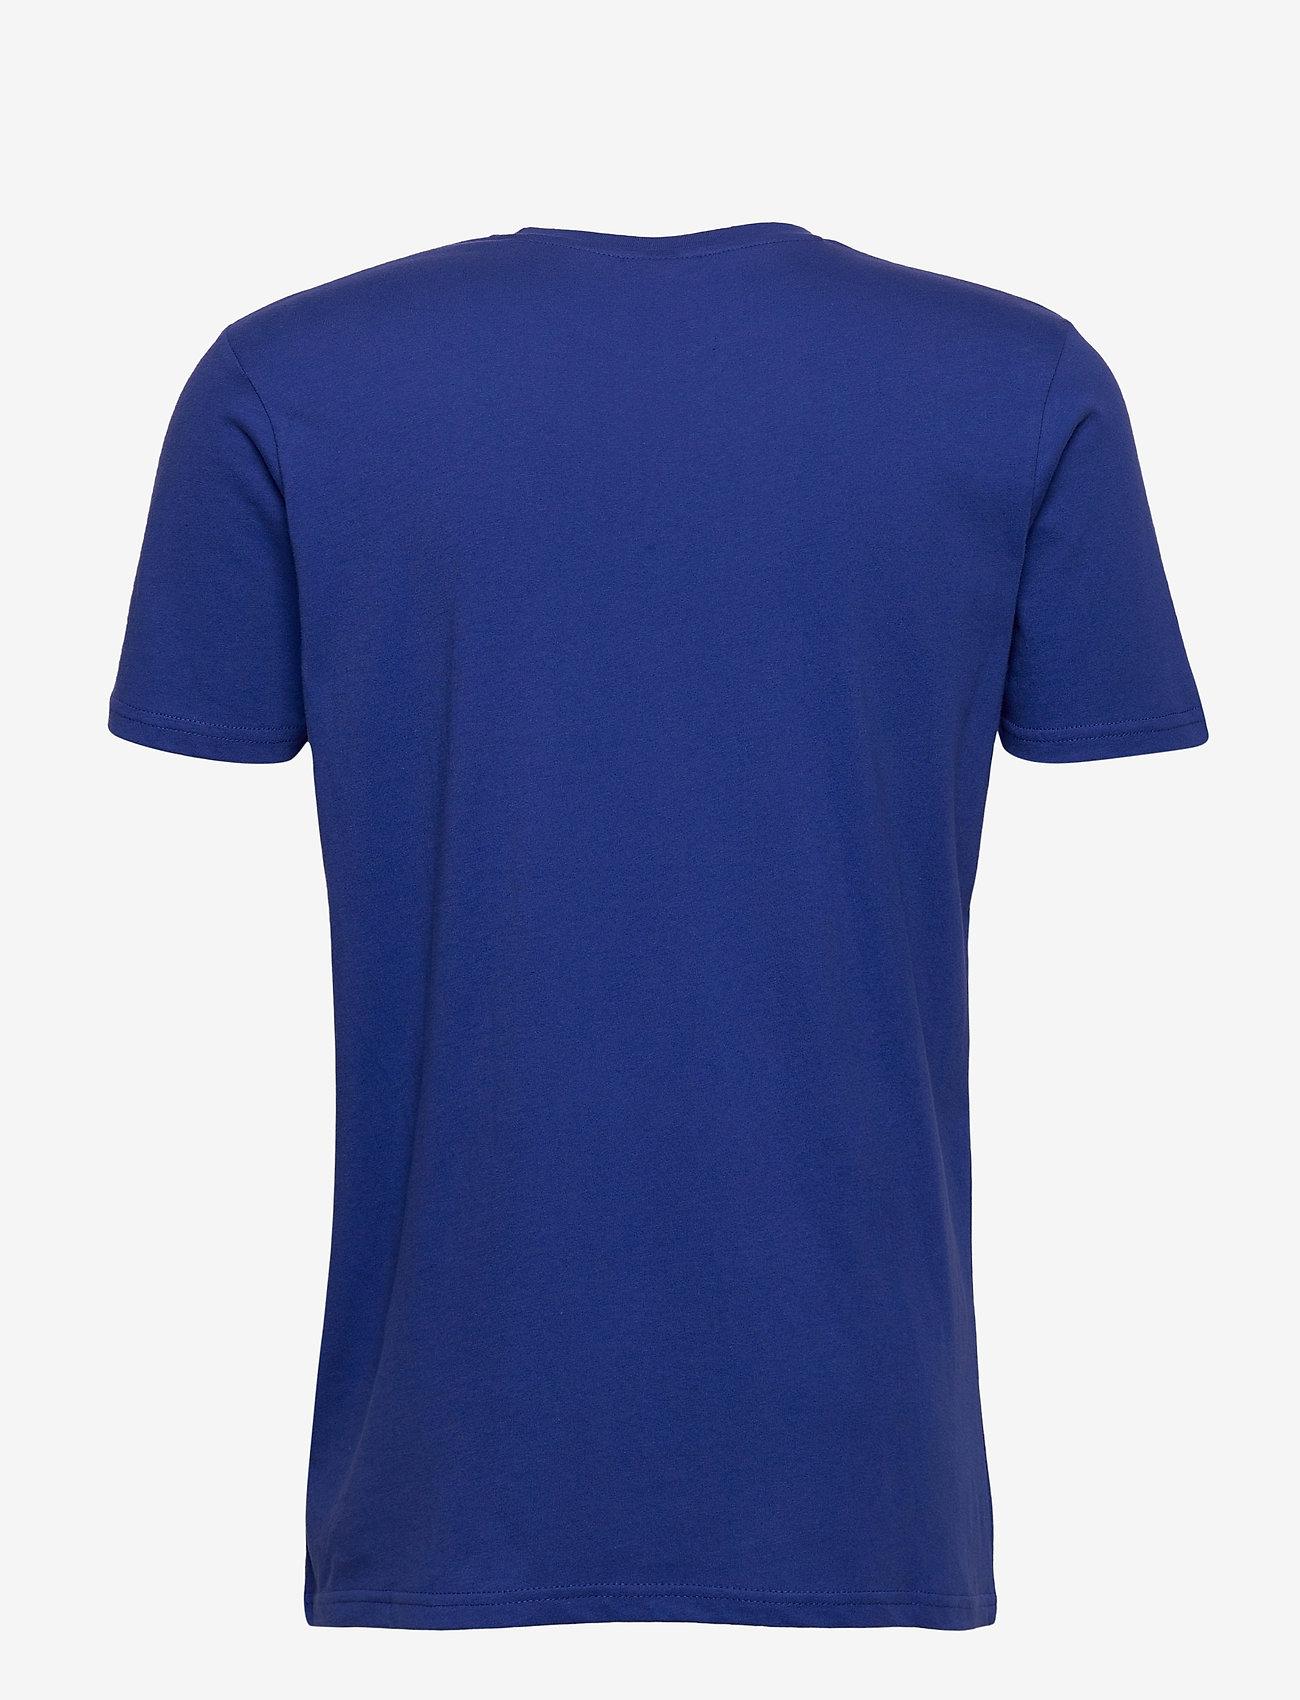 Ellesse EL SL PRADO TEE - T-skjorter BLUE - Menn Klær